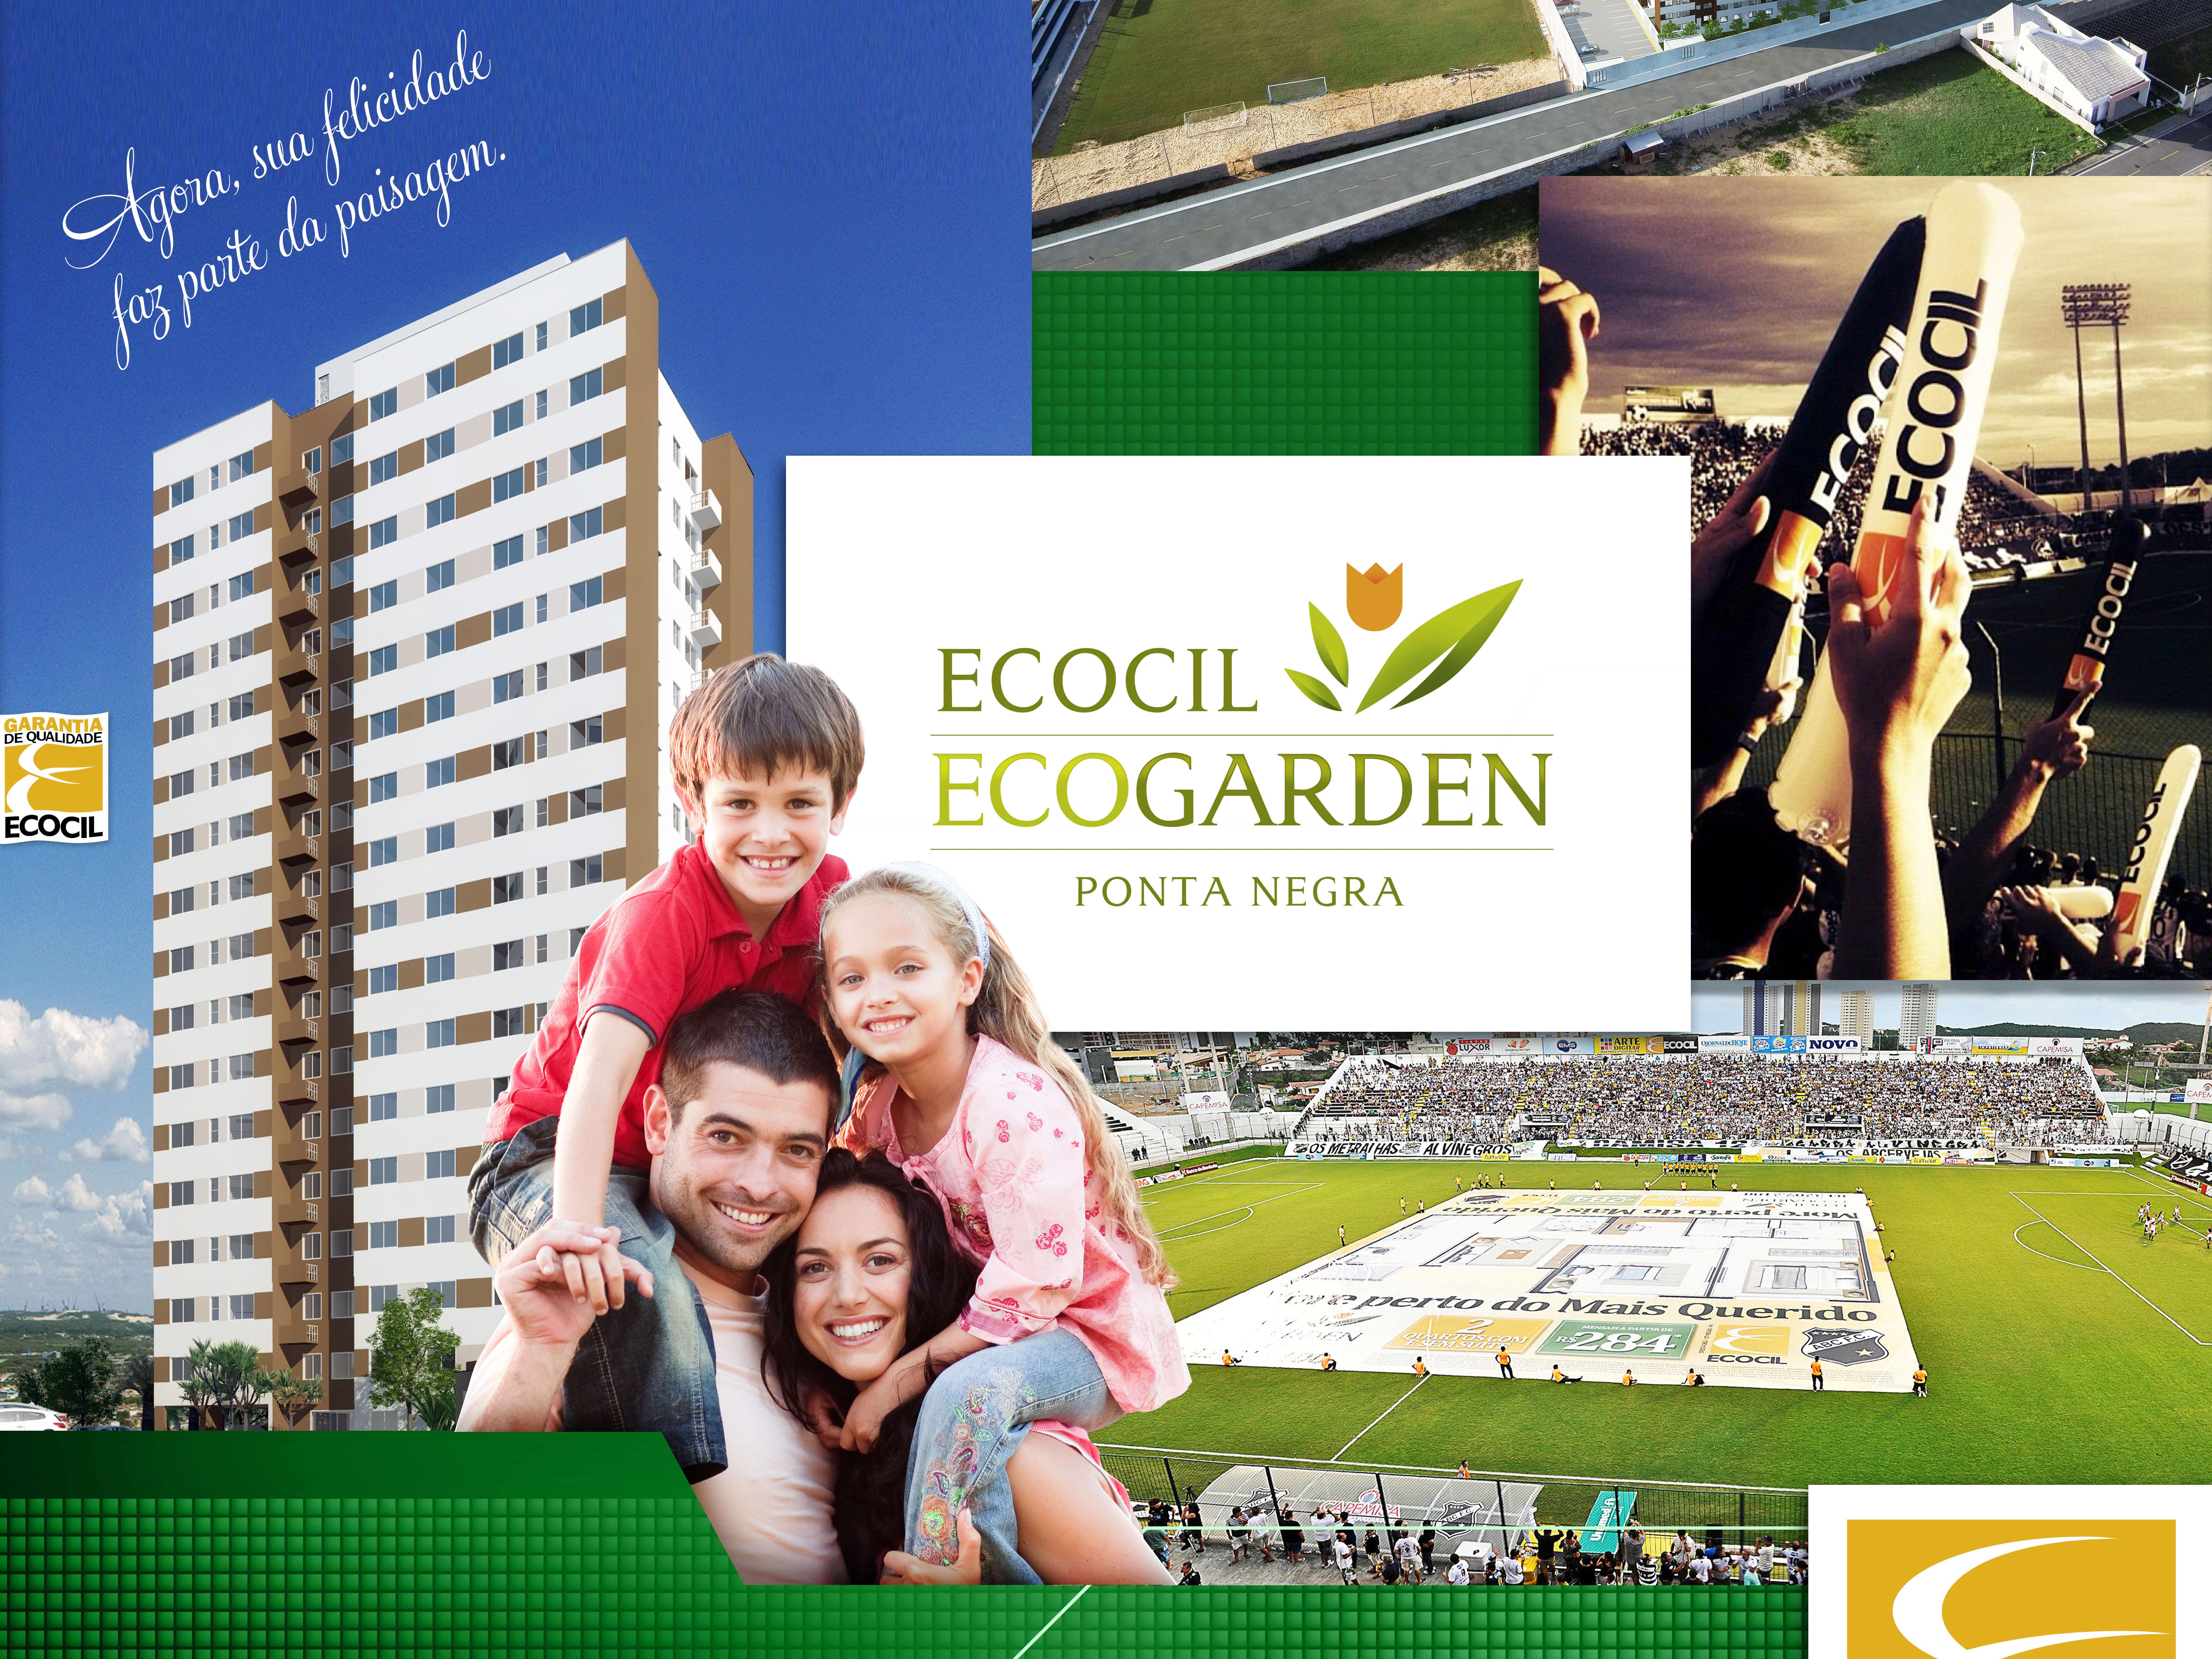 Ecocil Ecogarden Ponta Negra - ABC FC